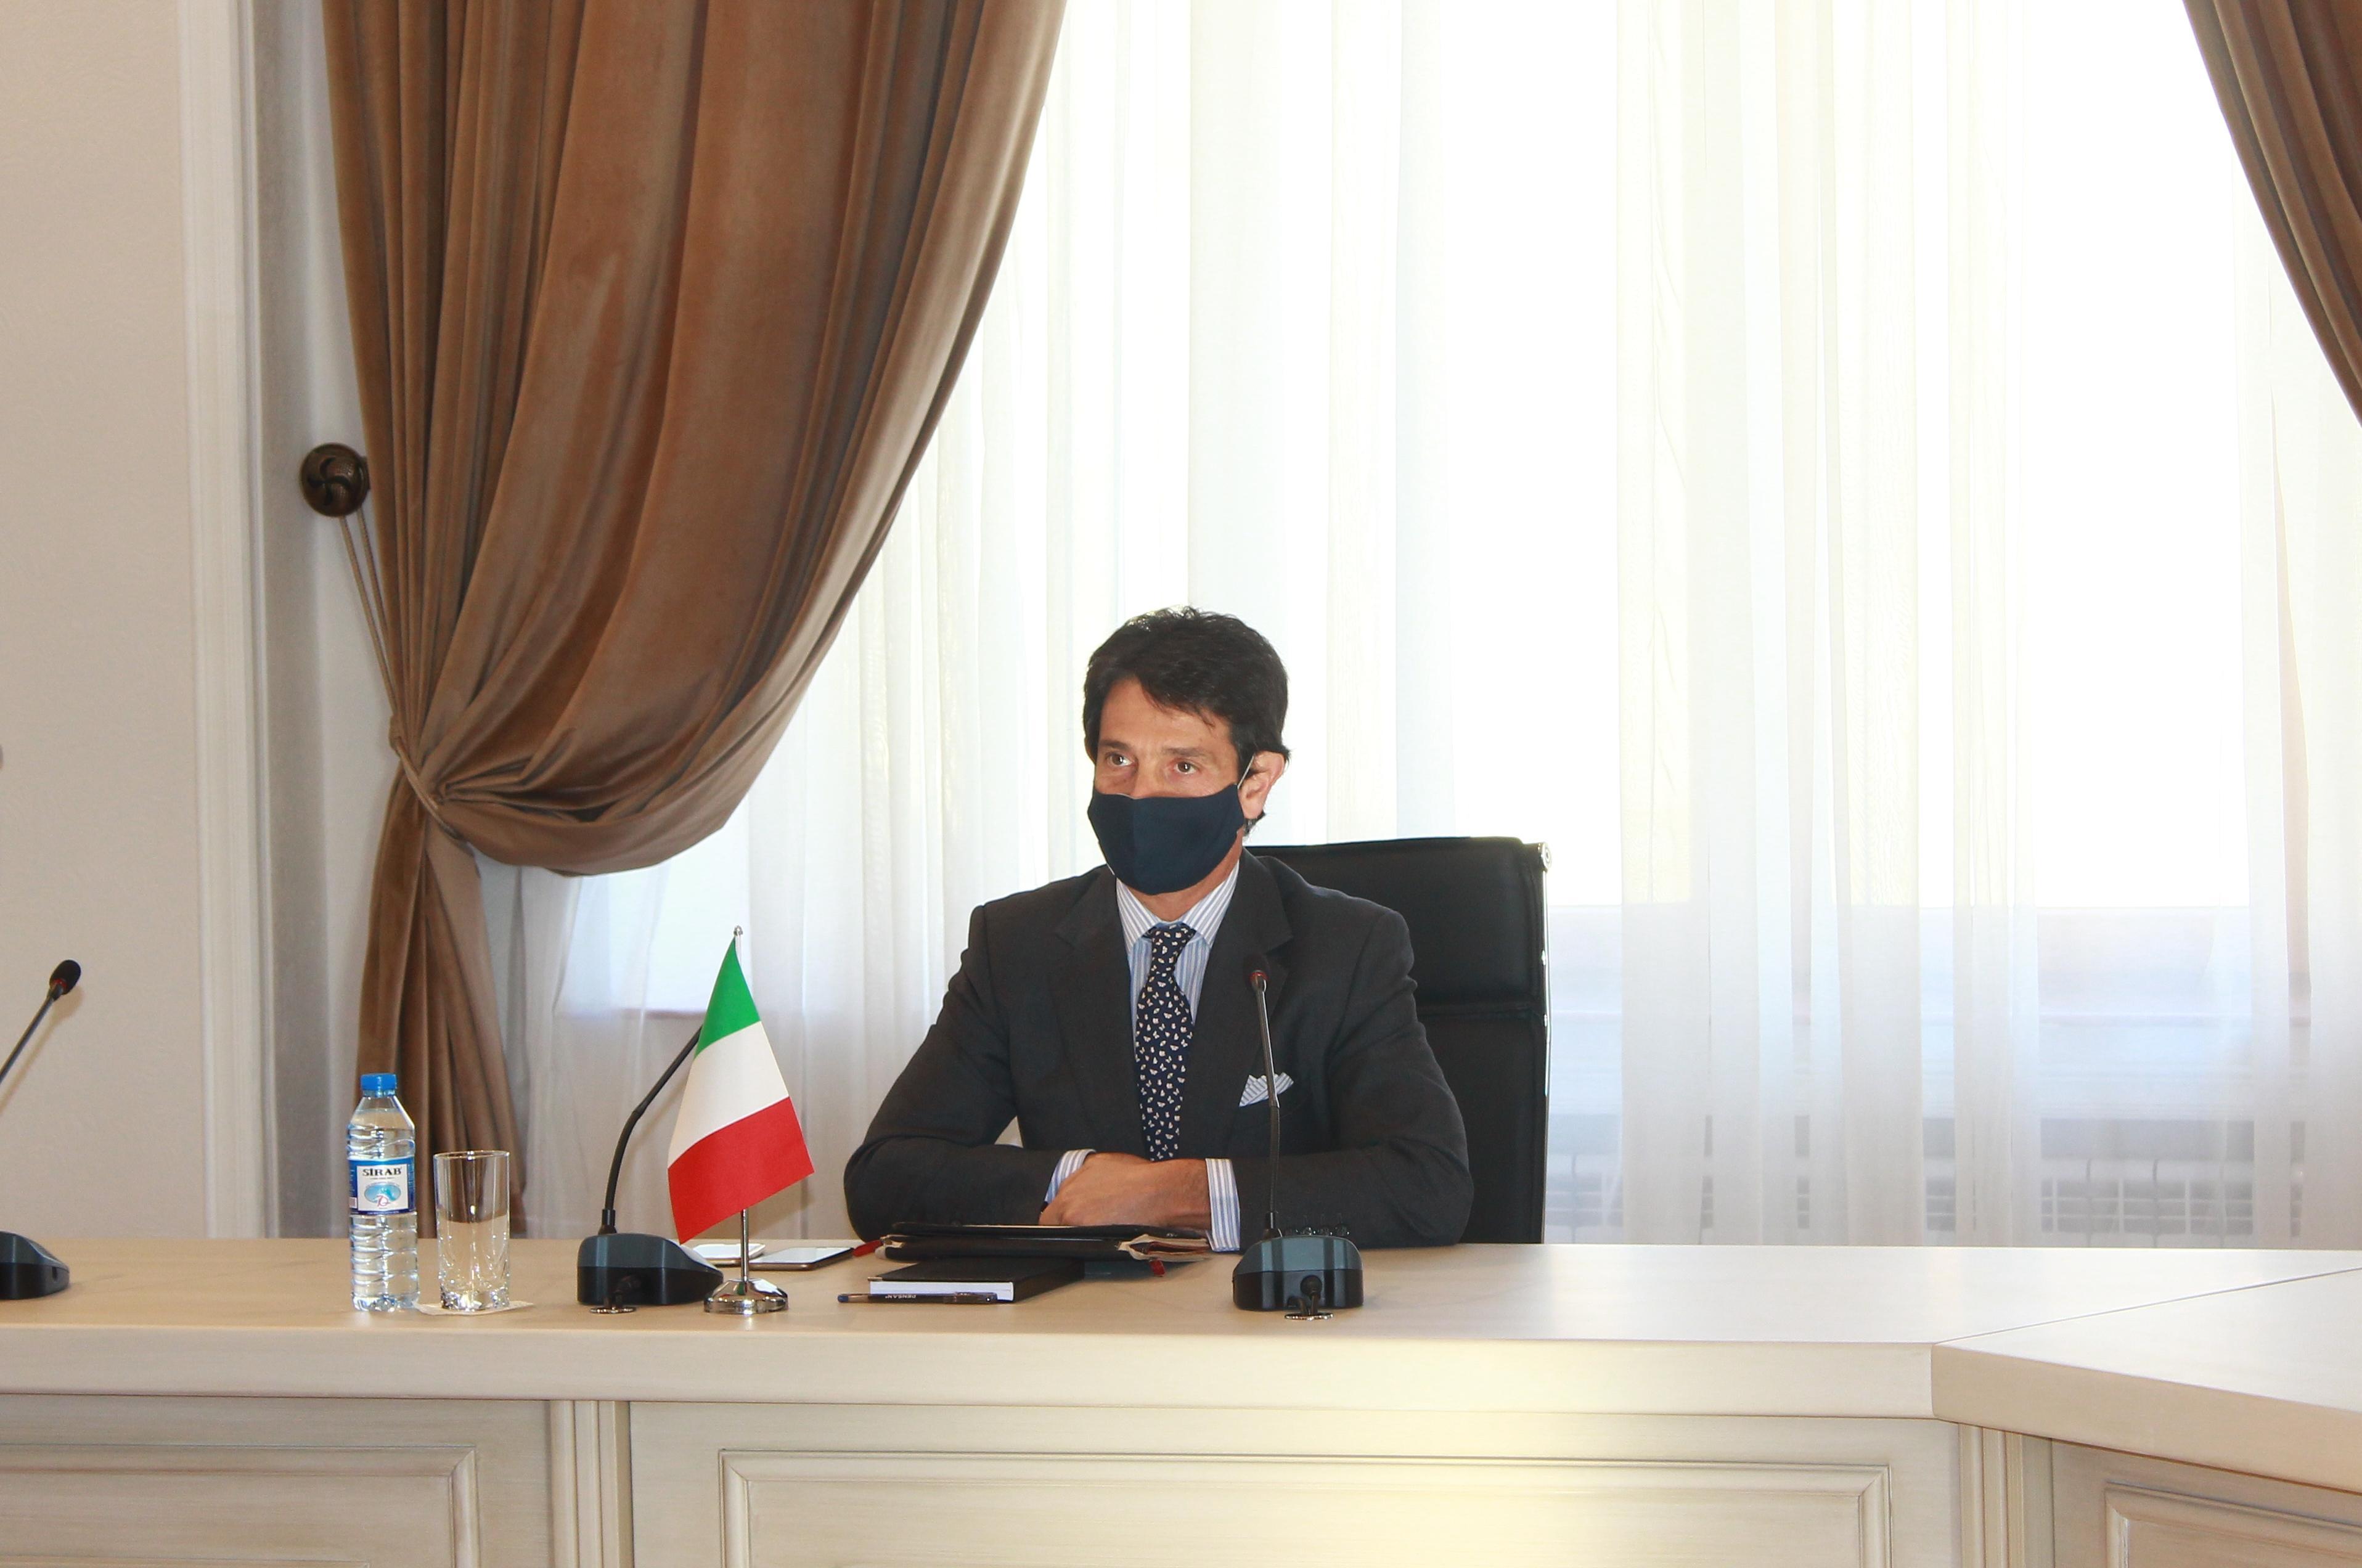 Augusto Massari